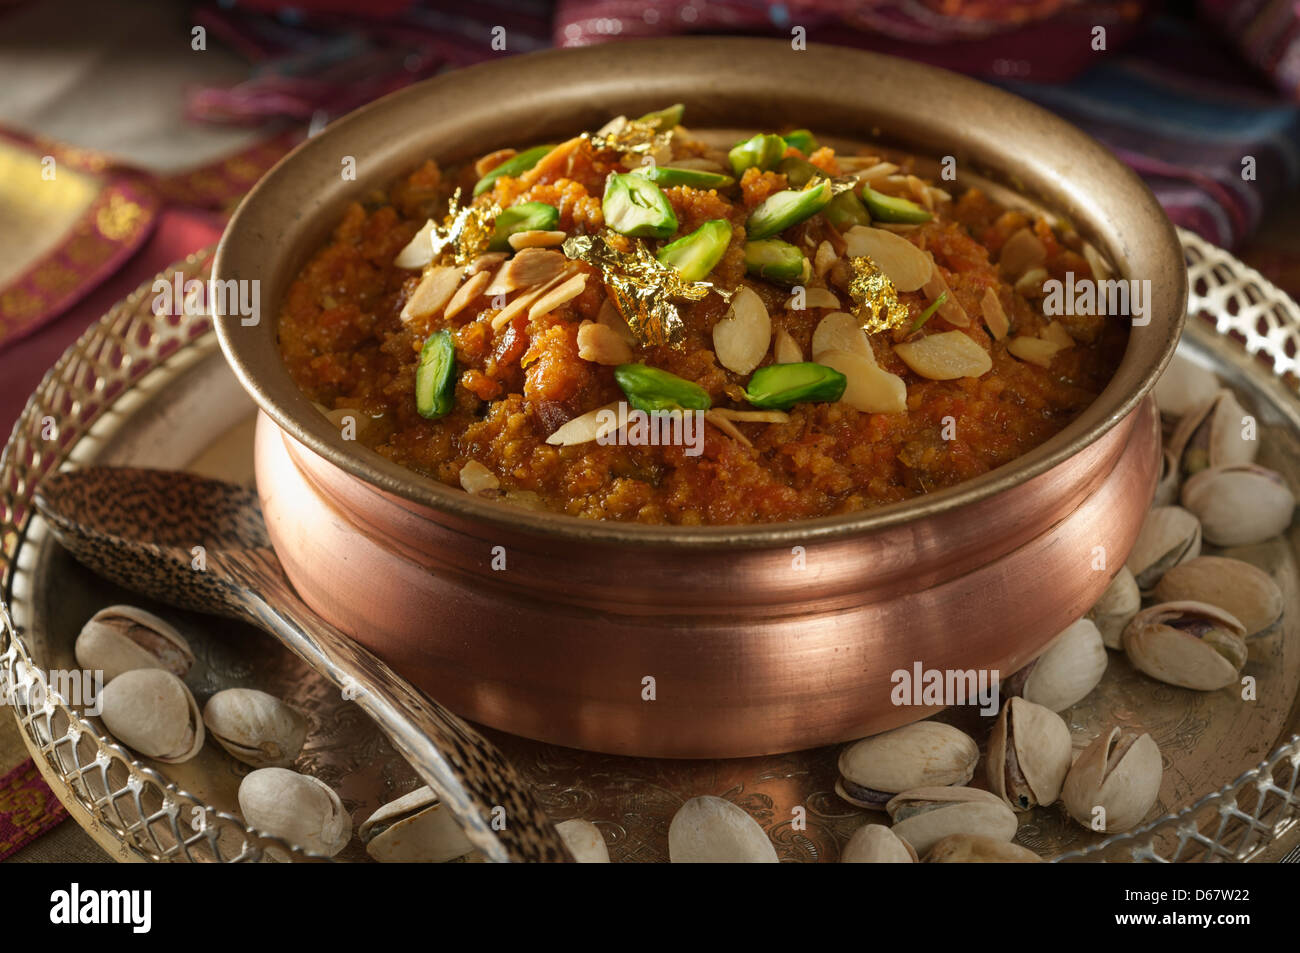 Gajar halwa Carrot halwa Traditional Indian dessert - Stock Image